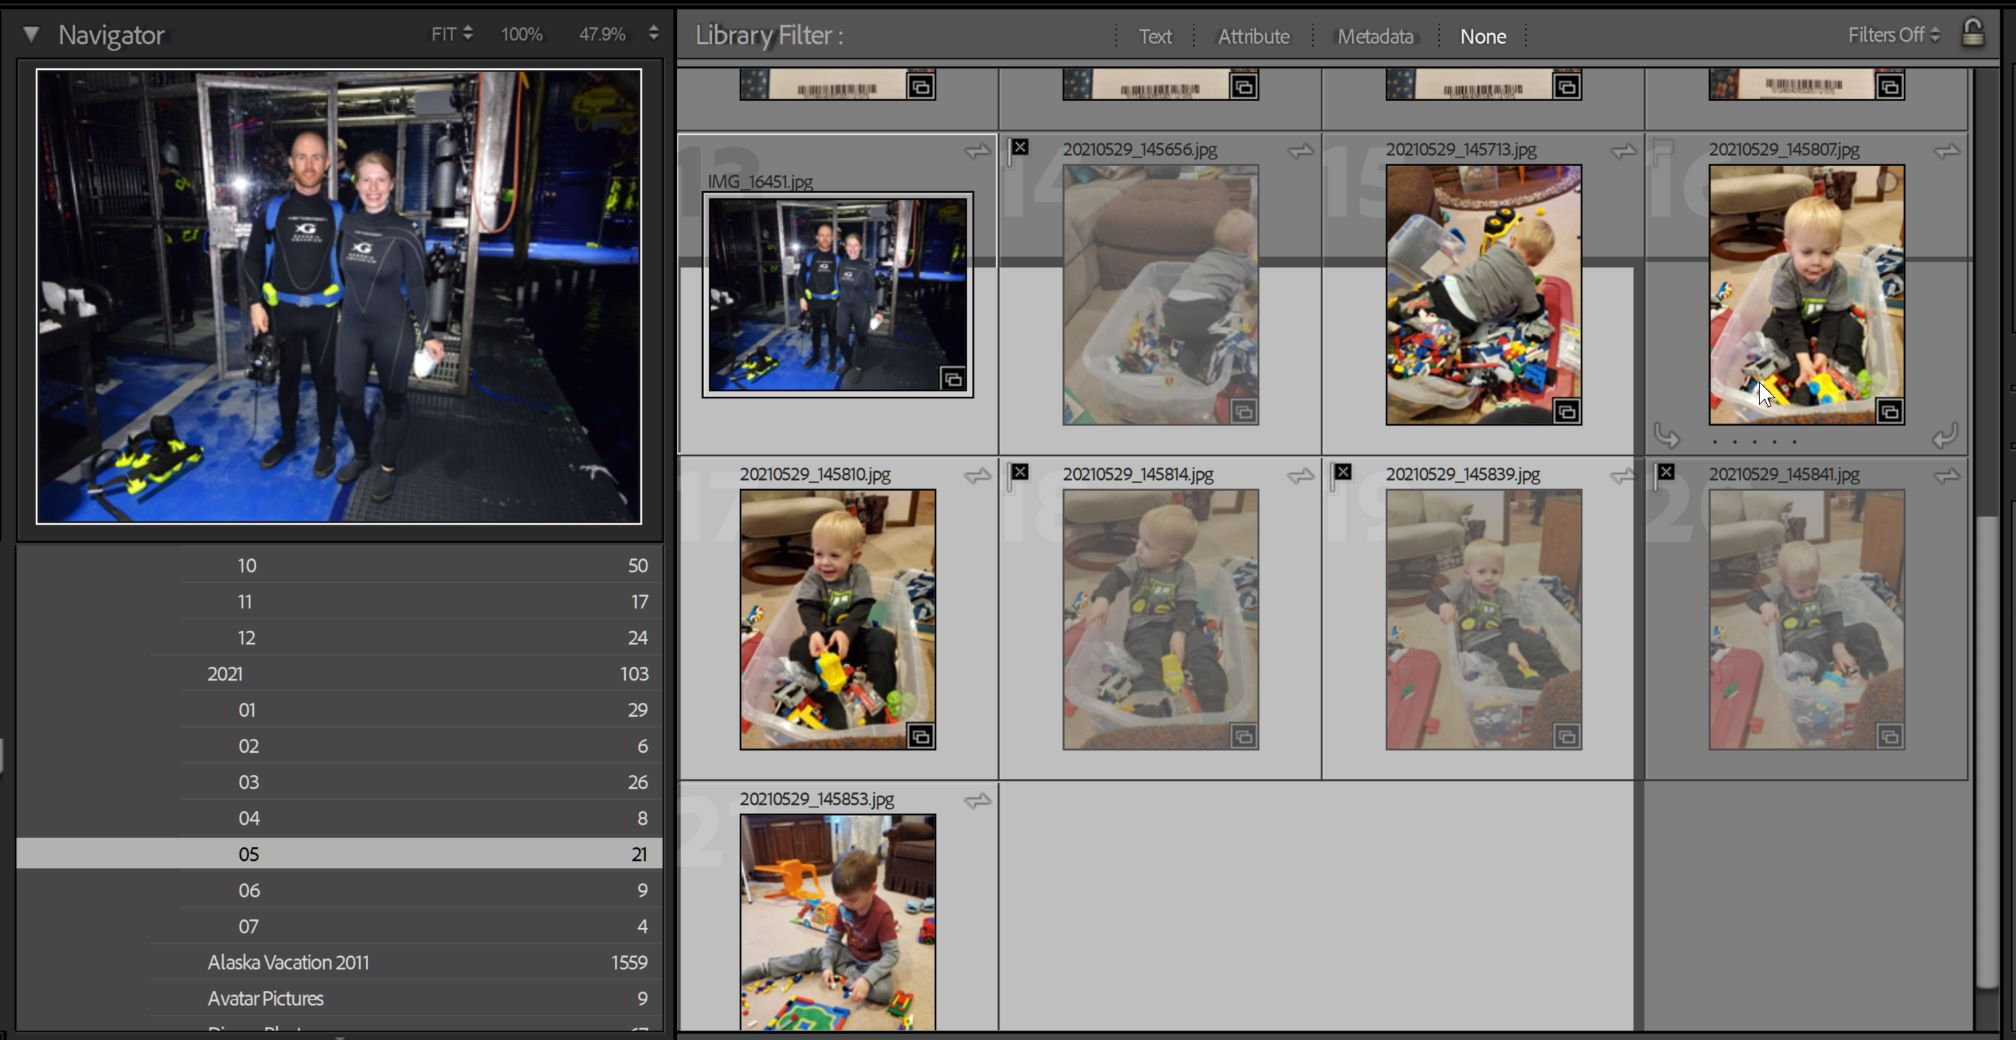 Lightroom Catalog-v10 - Adobe Photoshop Lightroom Classic - Library-2021-07-09 13_16_59.jpeg